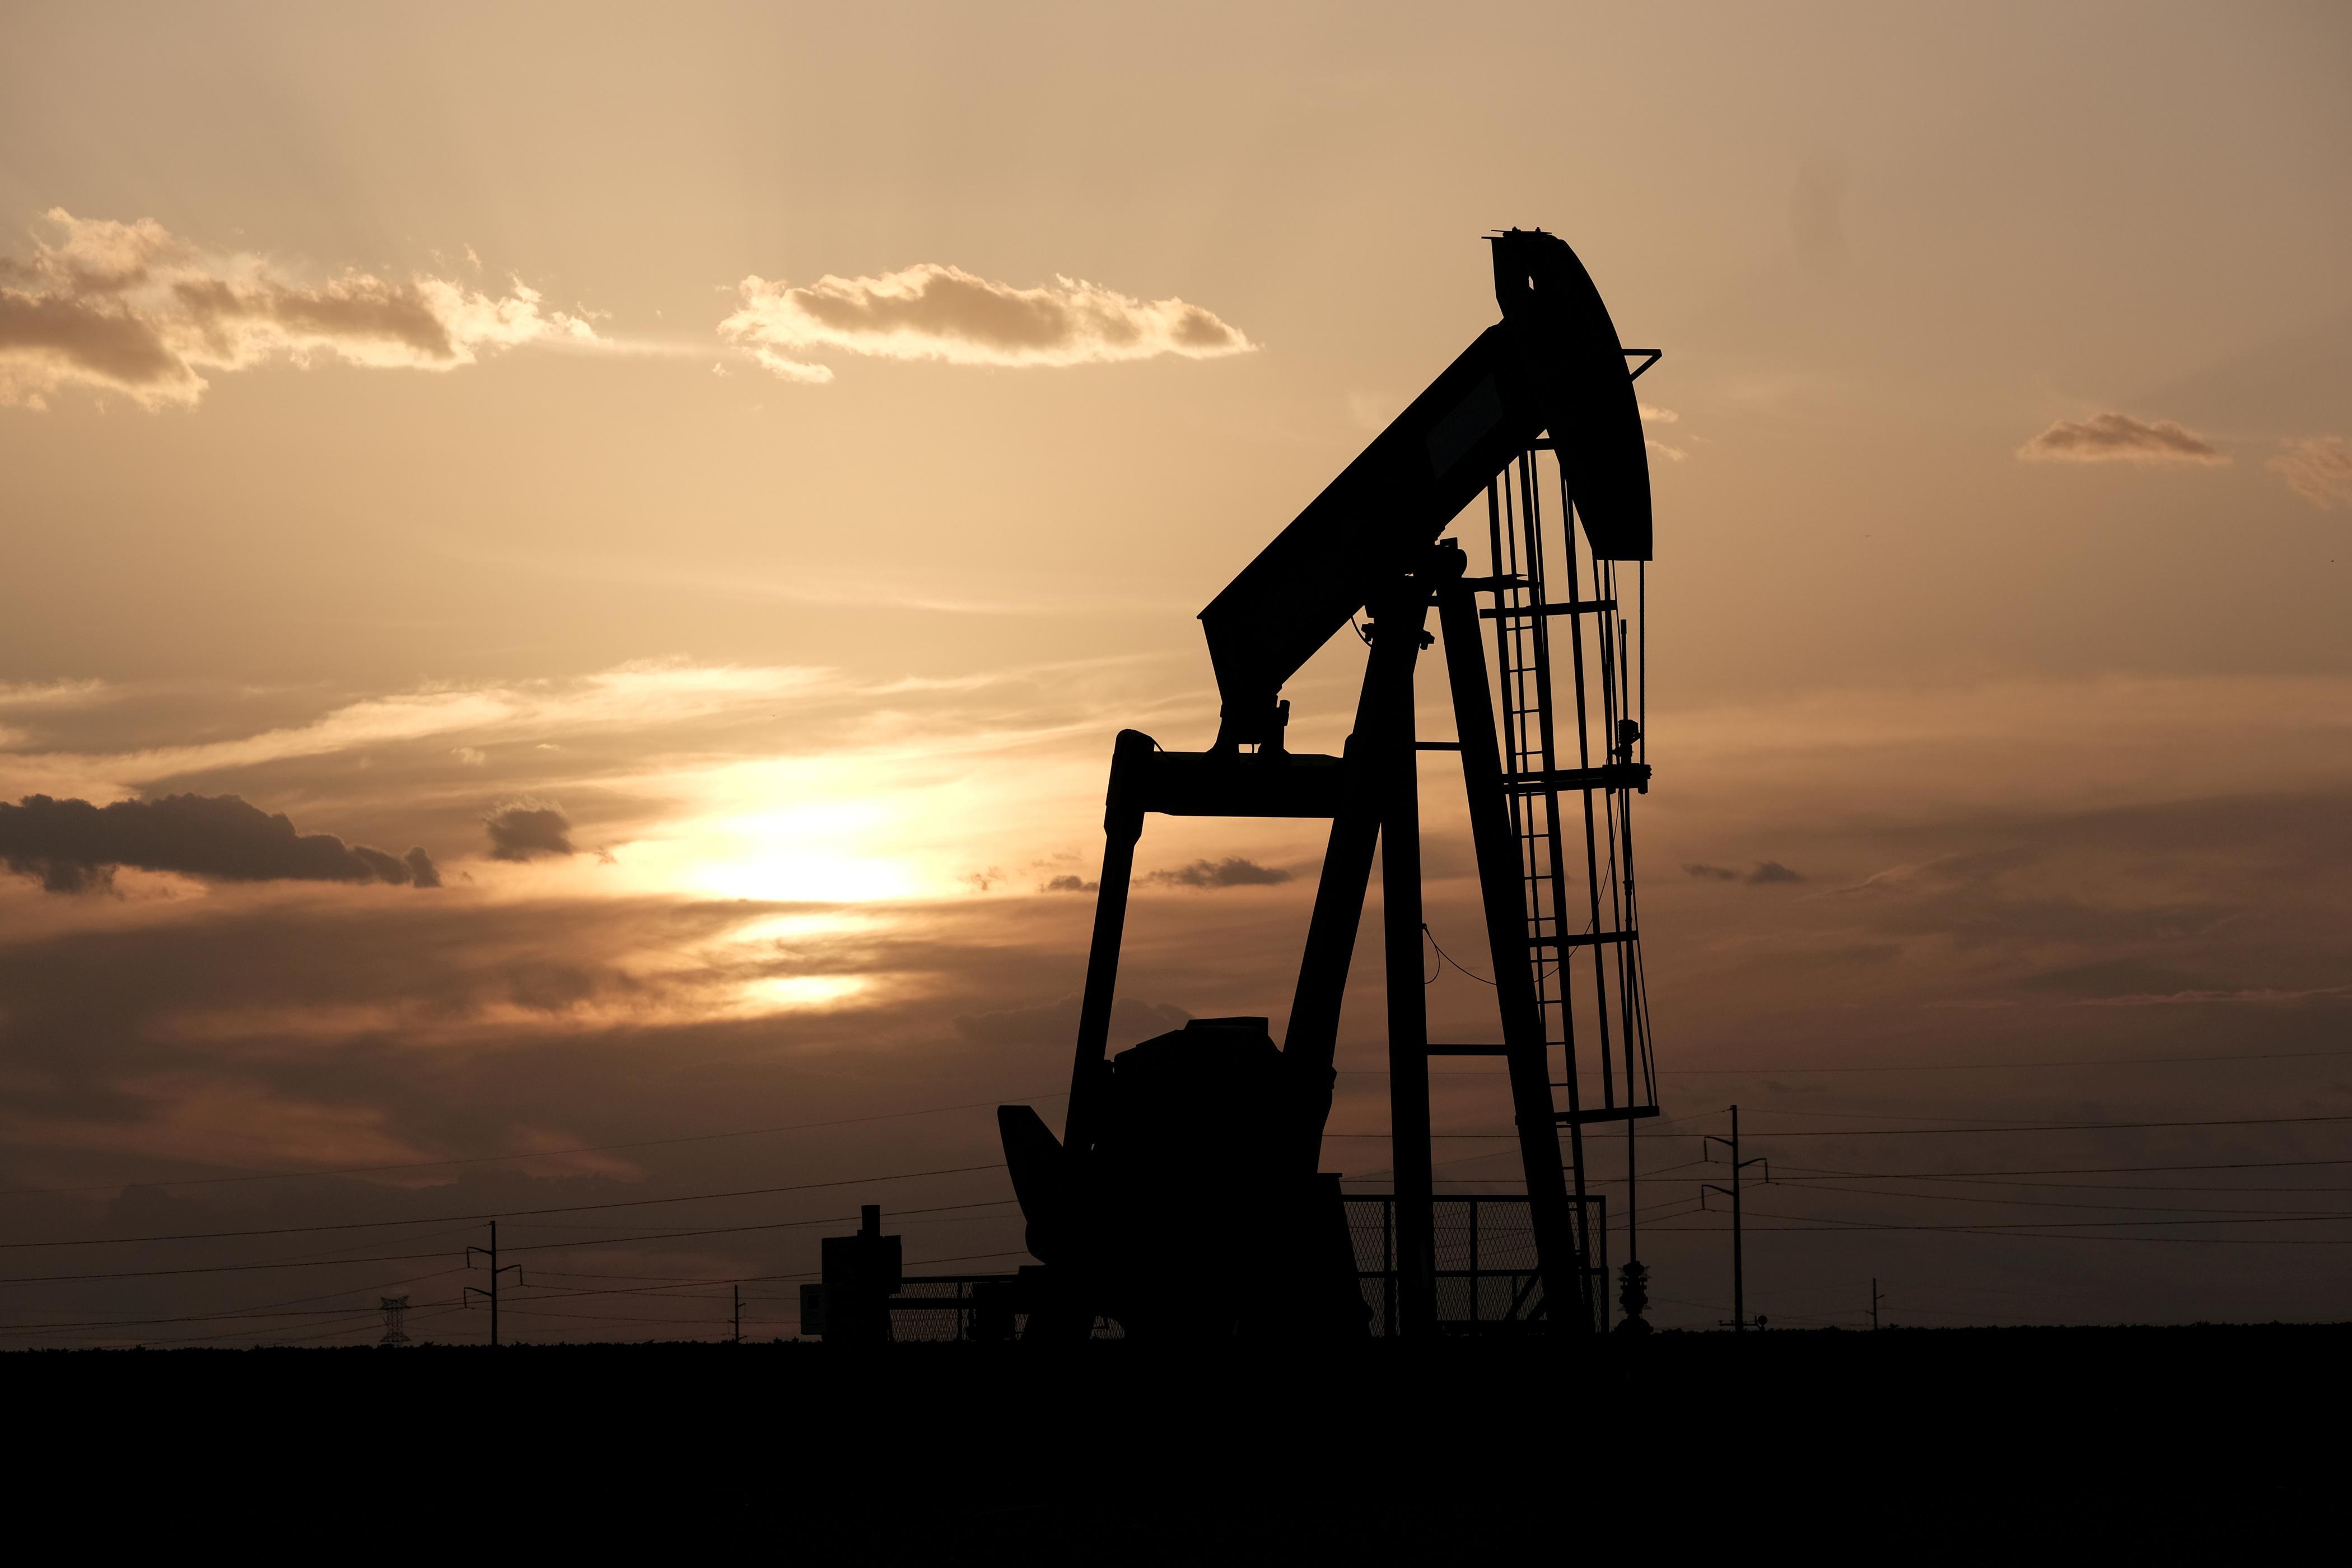 Oil prices gain 2% despite concerns about rising supplies